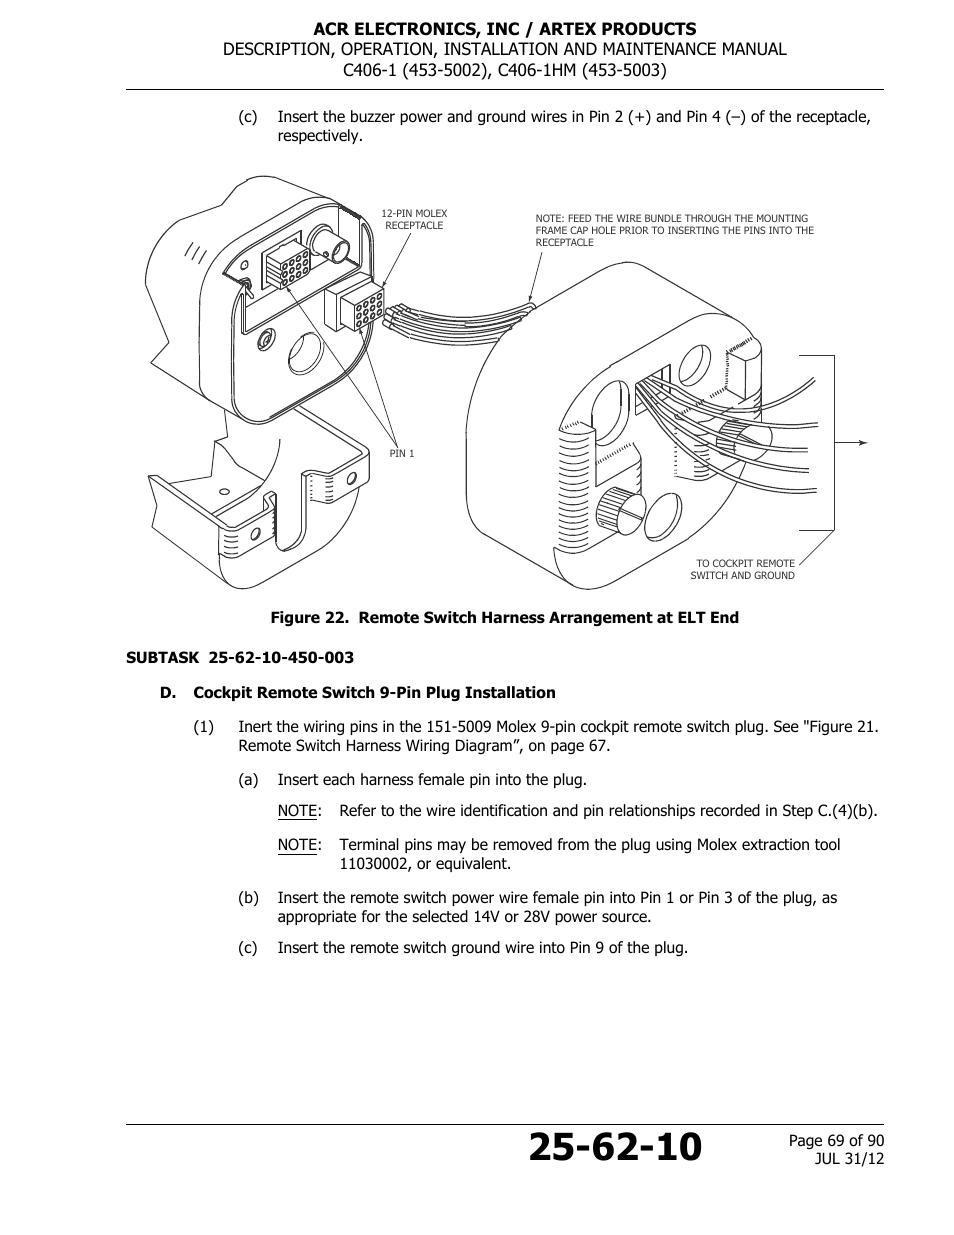 medium resolution of pin to wiring diagram on 15 pin connector diagram vga pin diagram